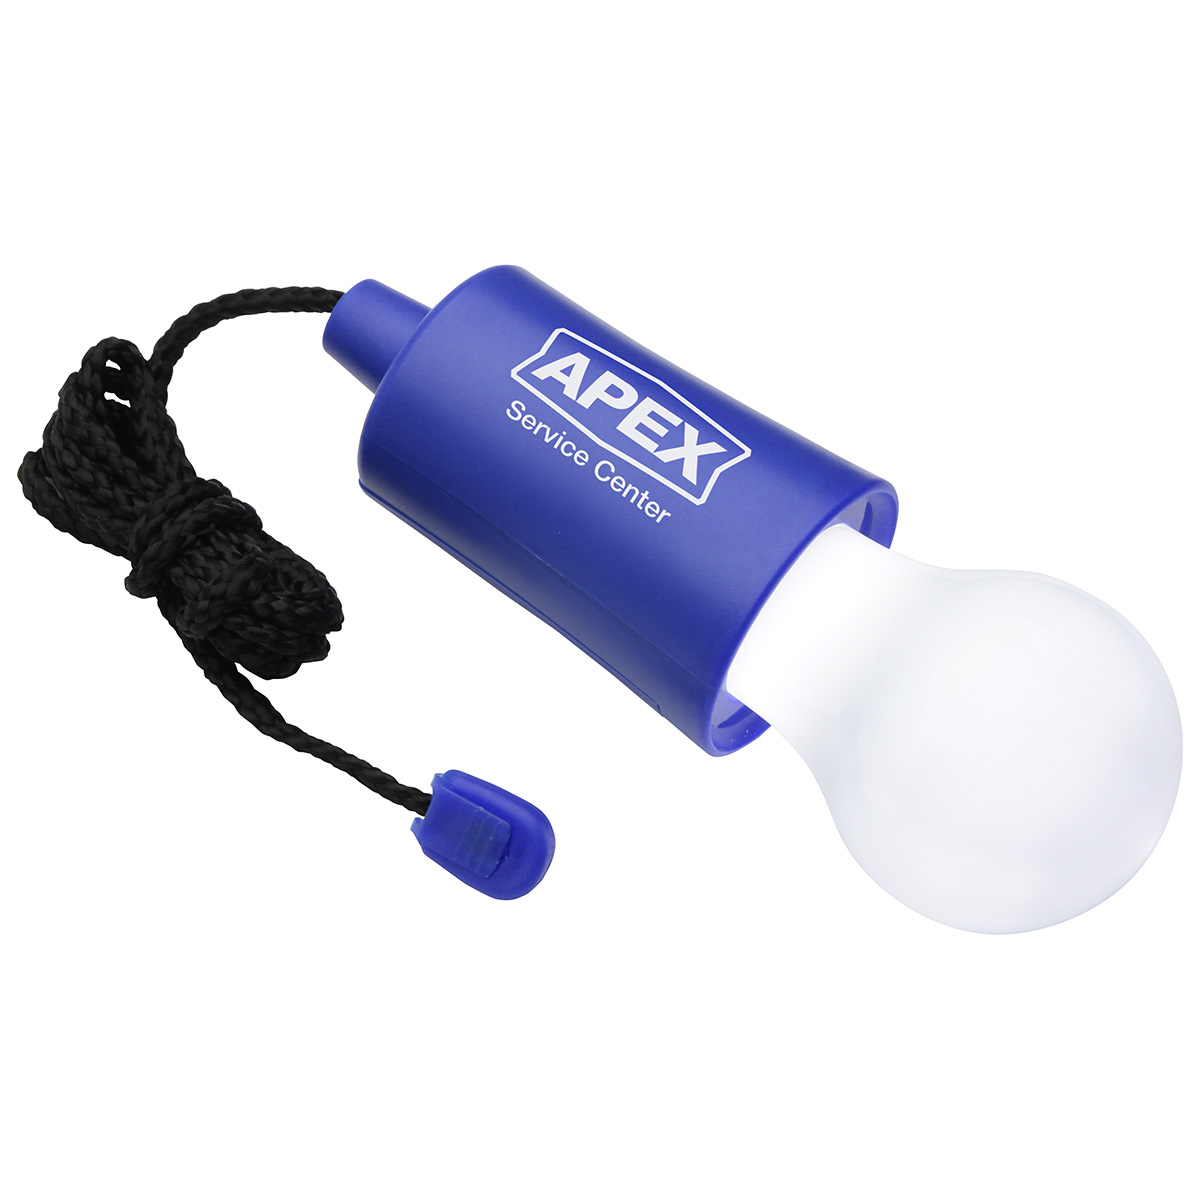 Hang Tight LED Ready Light, WLT-HT16 - 1 Colour Imprint